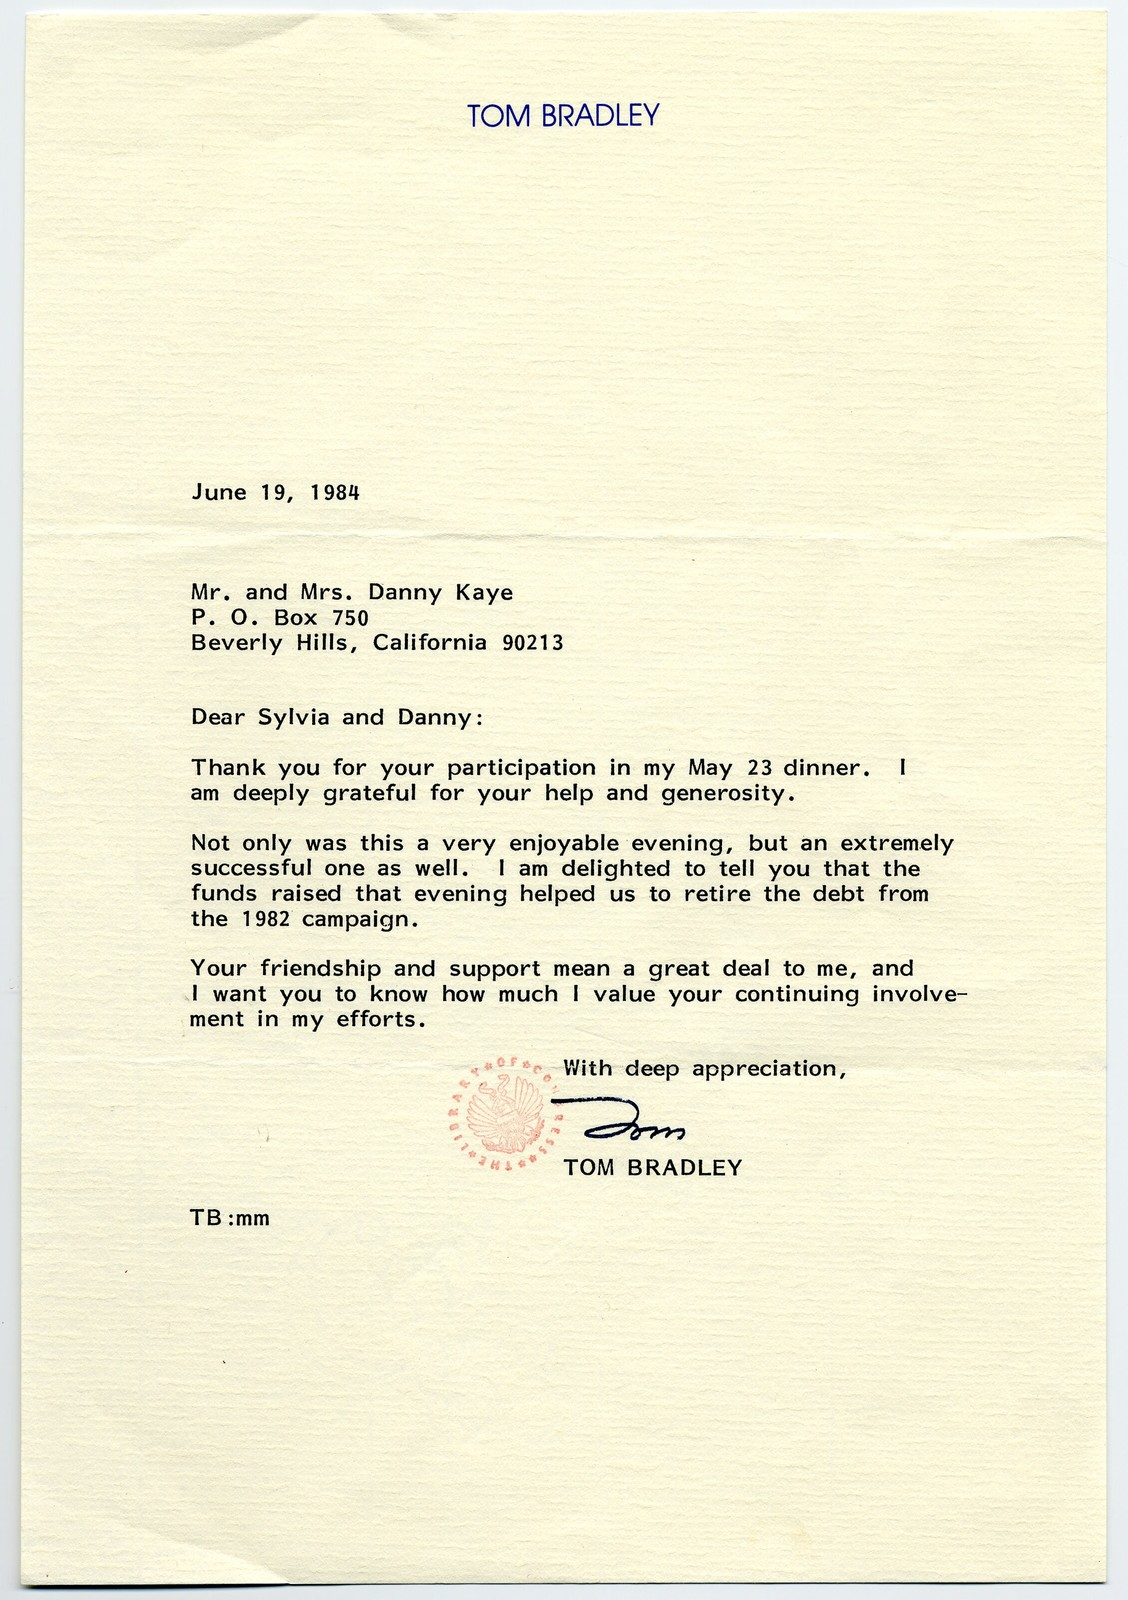 Tom Bradley, [Mayor of Los Angeles, 1973-1993], to Mr. and Mrs. Danny Kaye, June 19, 1984